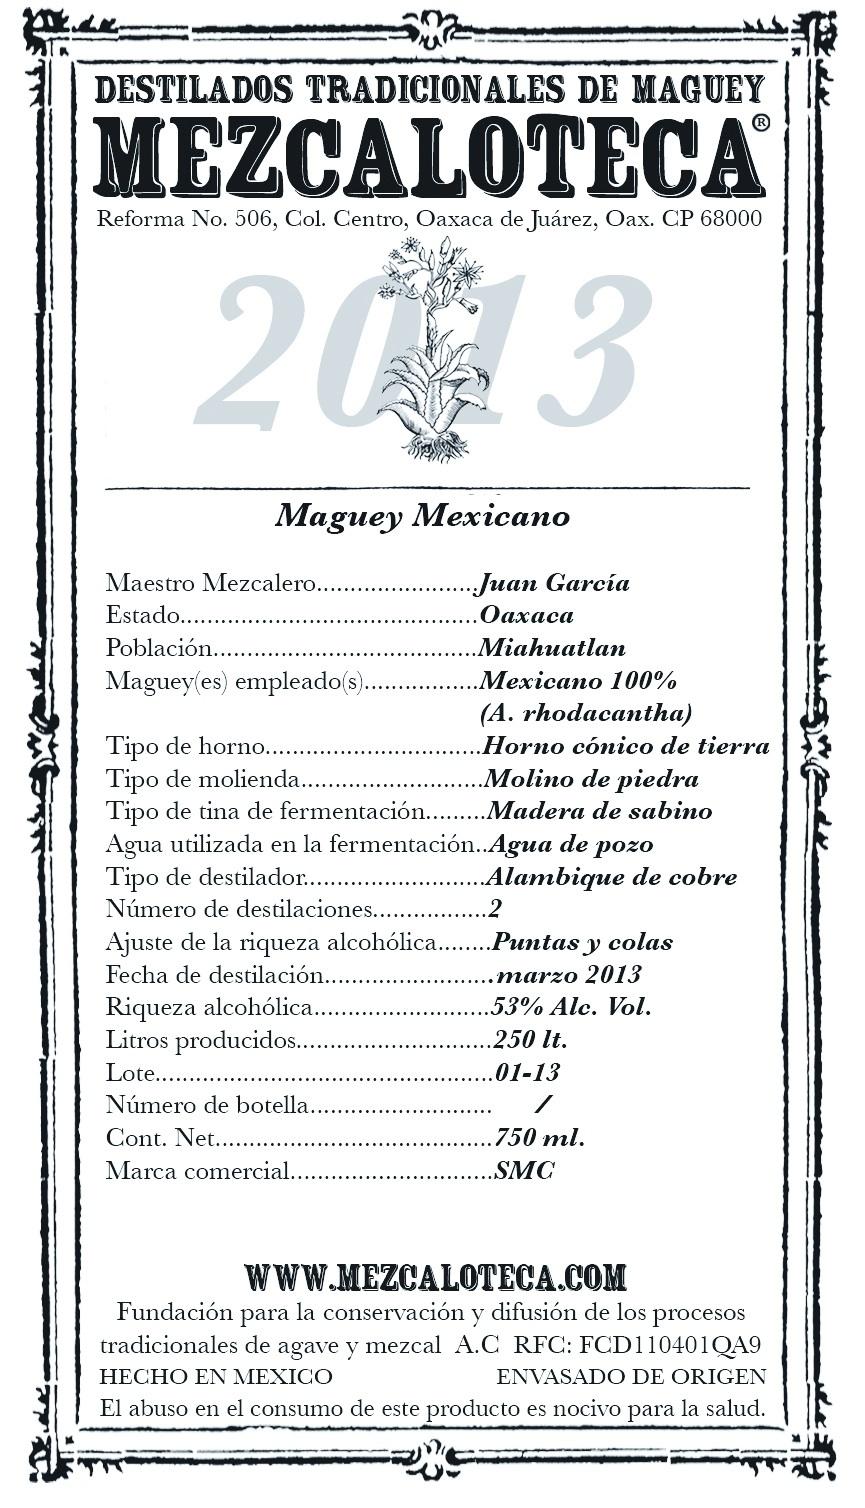 mexicano.JG.53.2013.750[1]_1 web.jpg